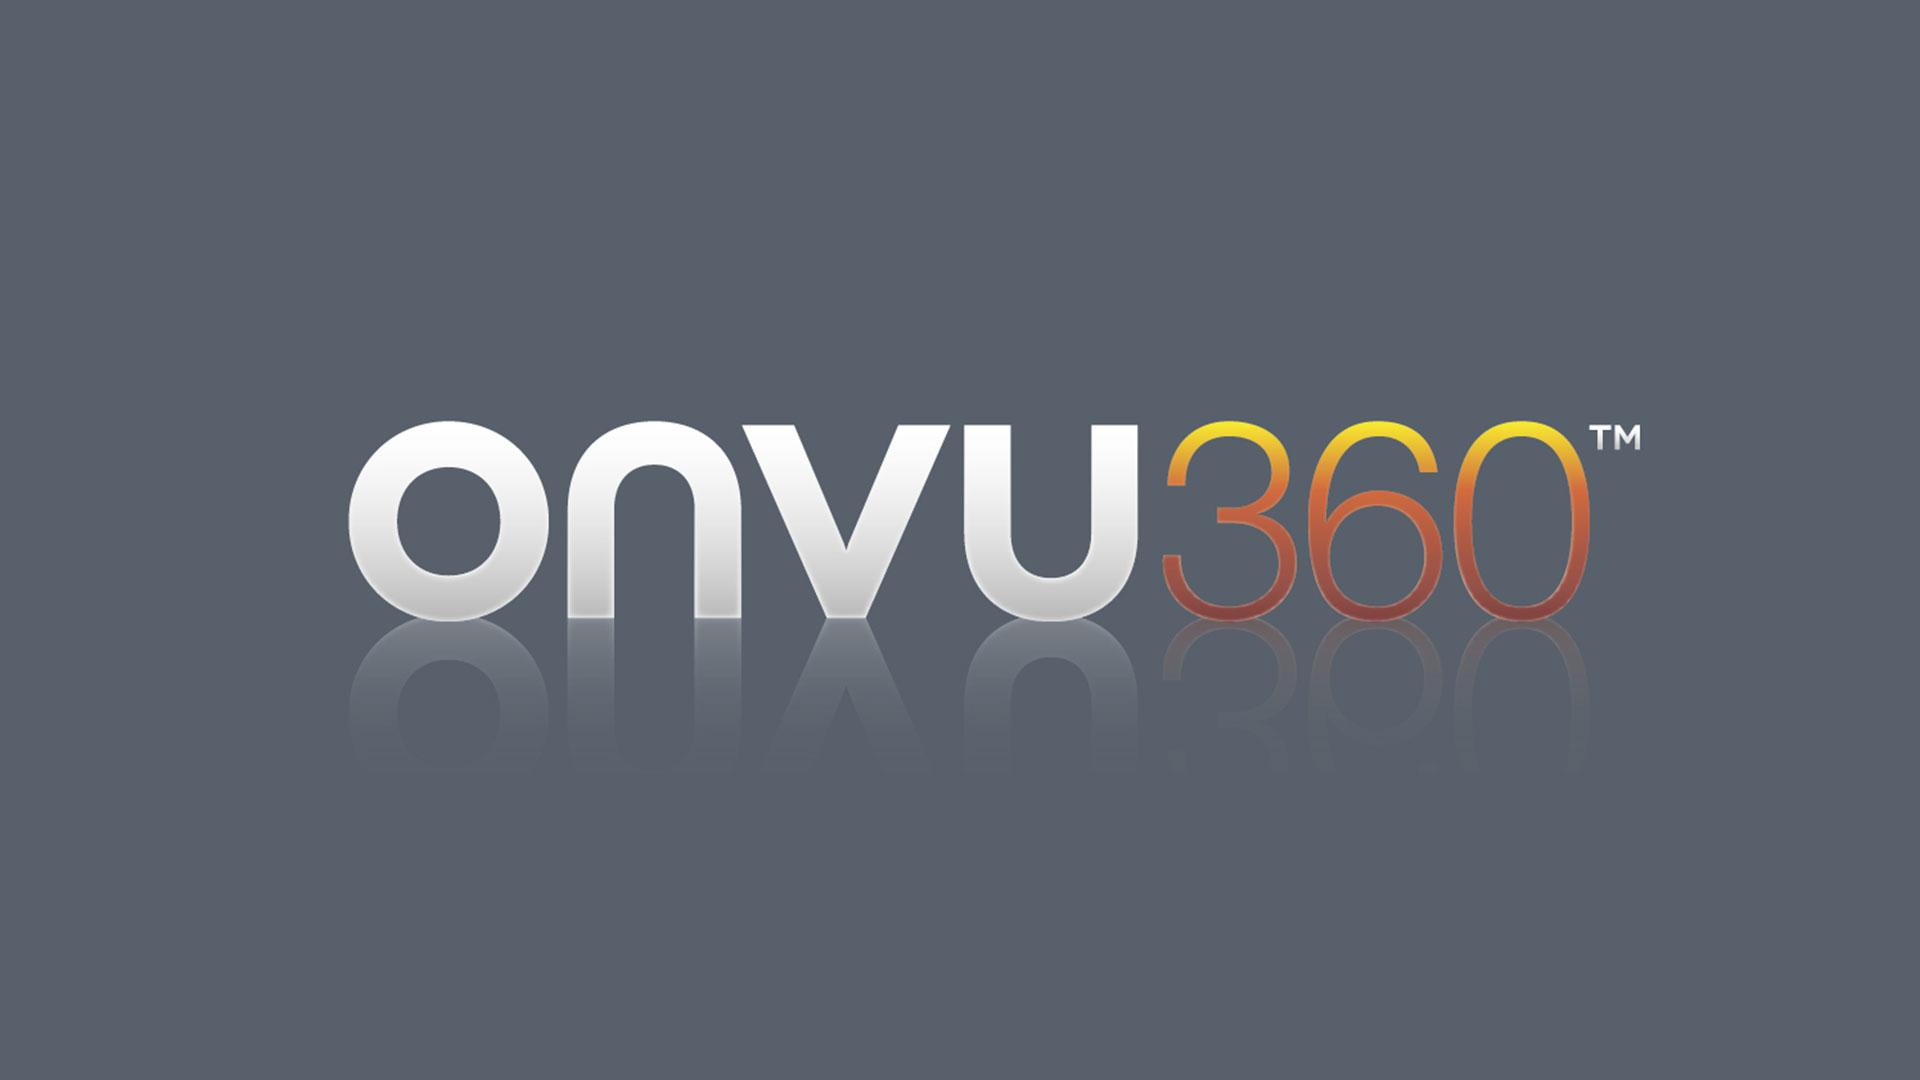 OnVu360_logo_dark